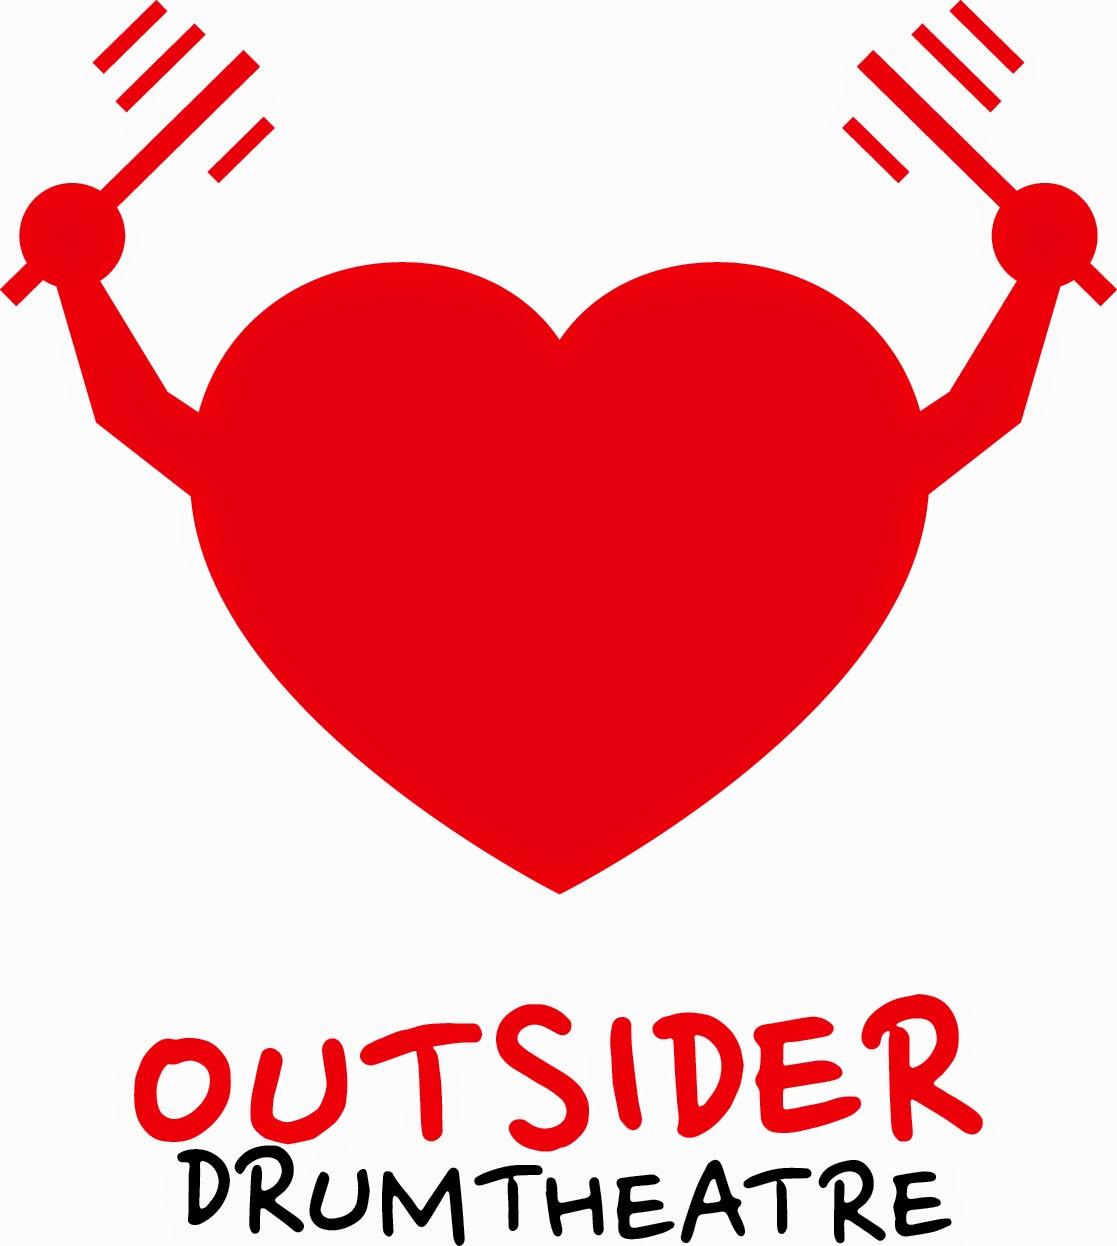 Associazione Outsider onlus Drum theatre